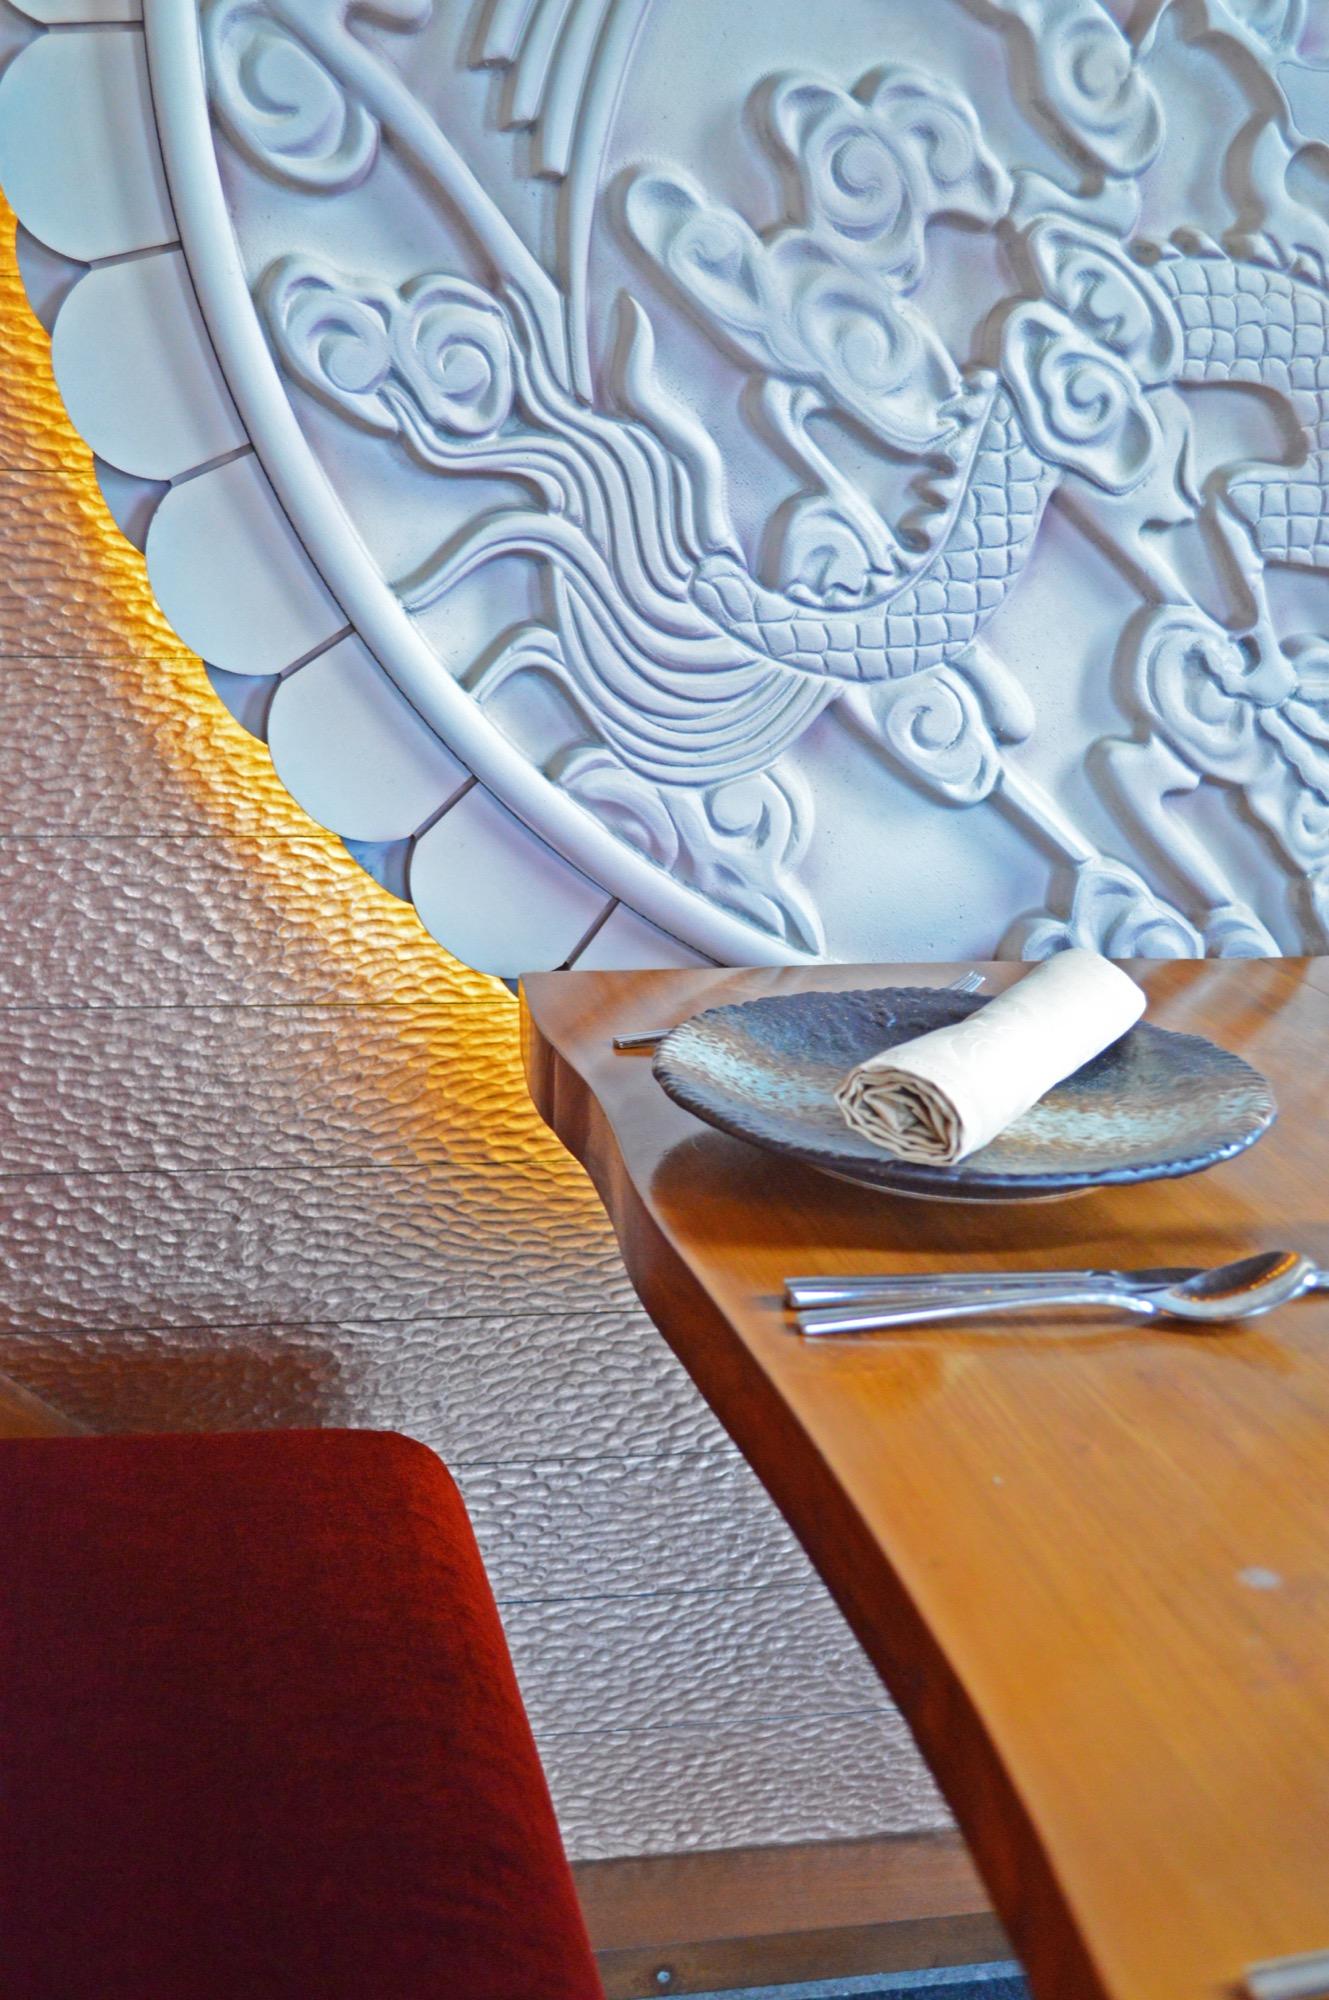 Best of Asia Village, Interior design for a restaurant at Delhi by Aspire Designs 9